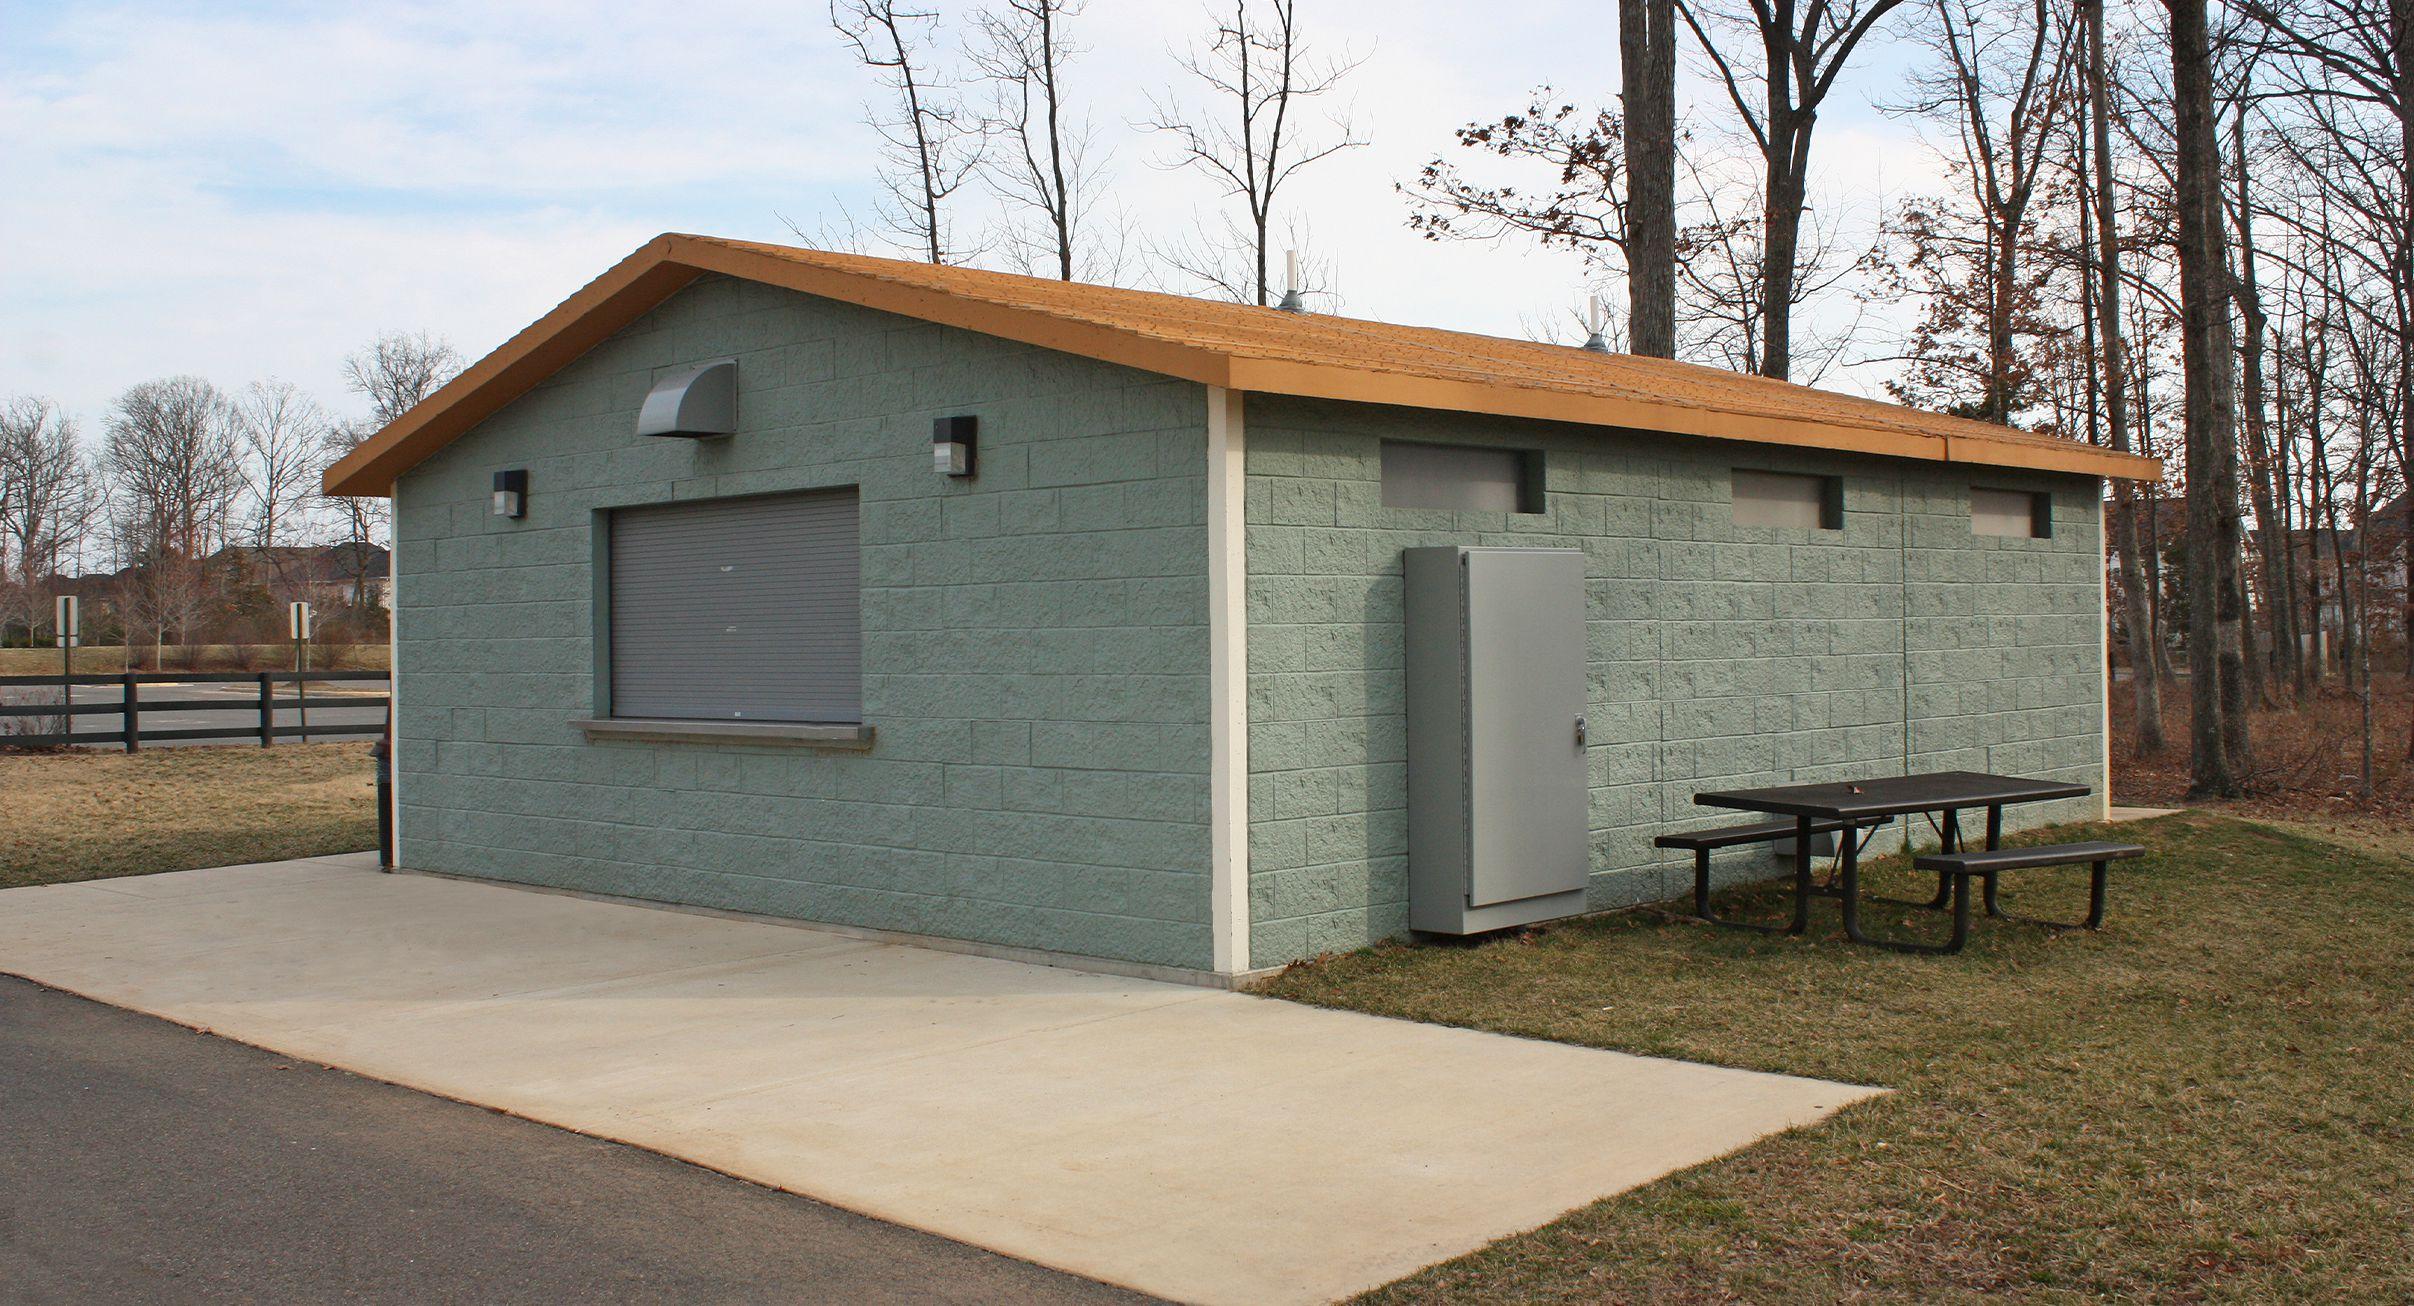 Loudoun Appalachian 24x30 concession stand